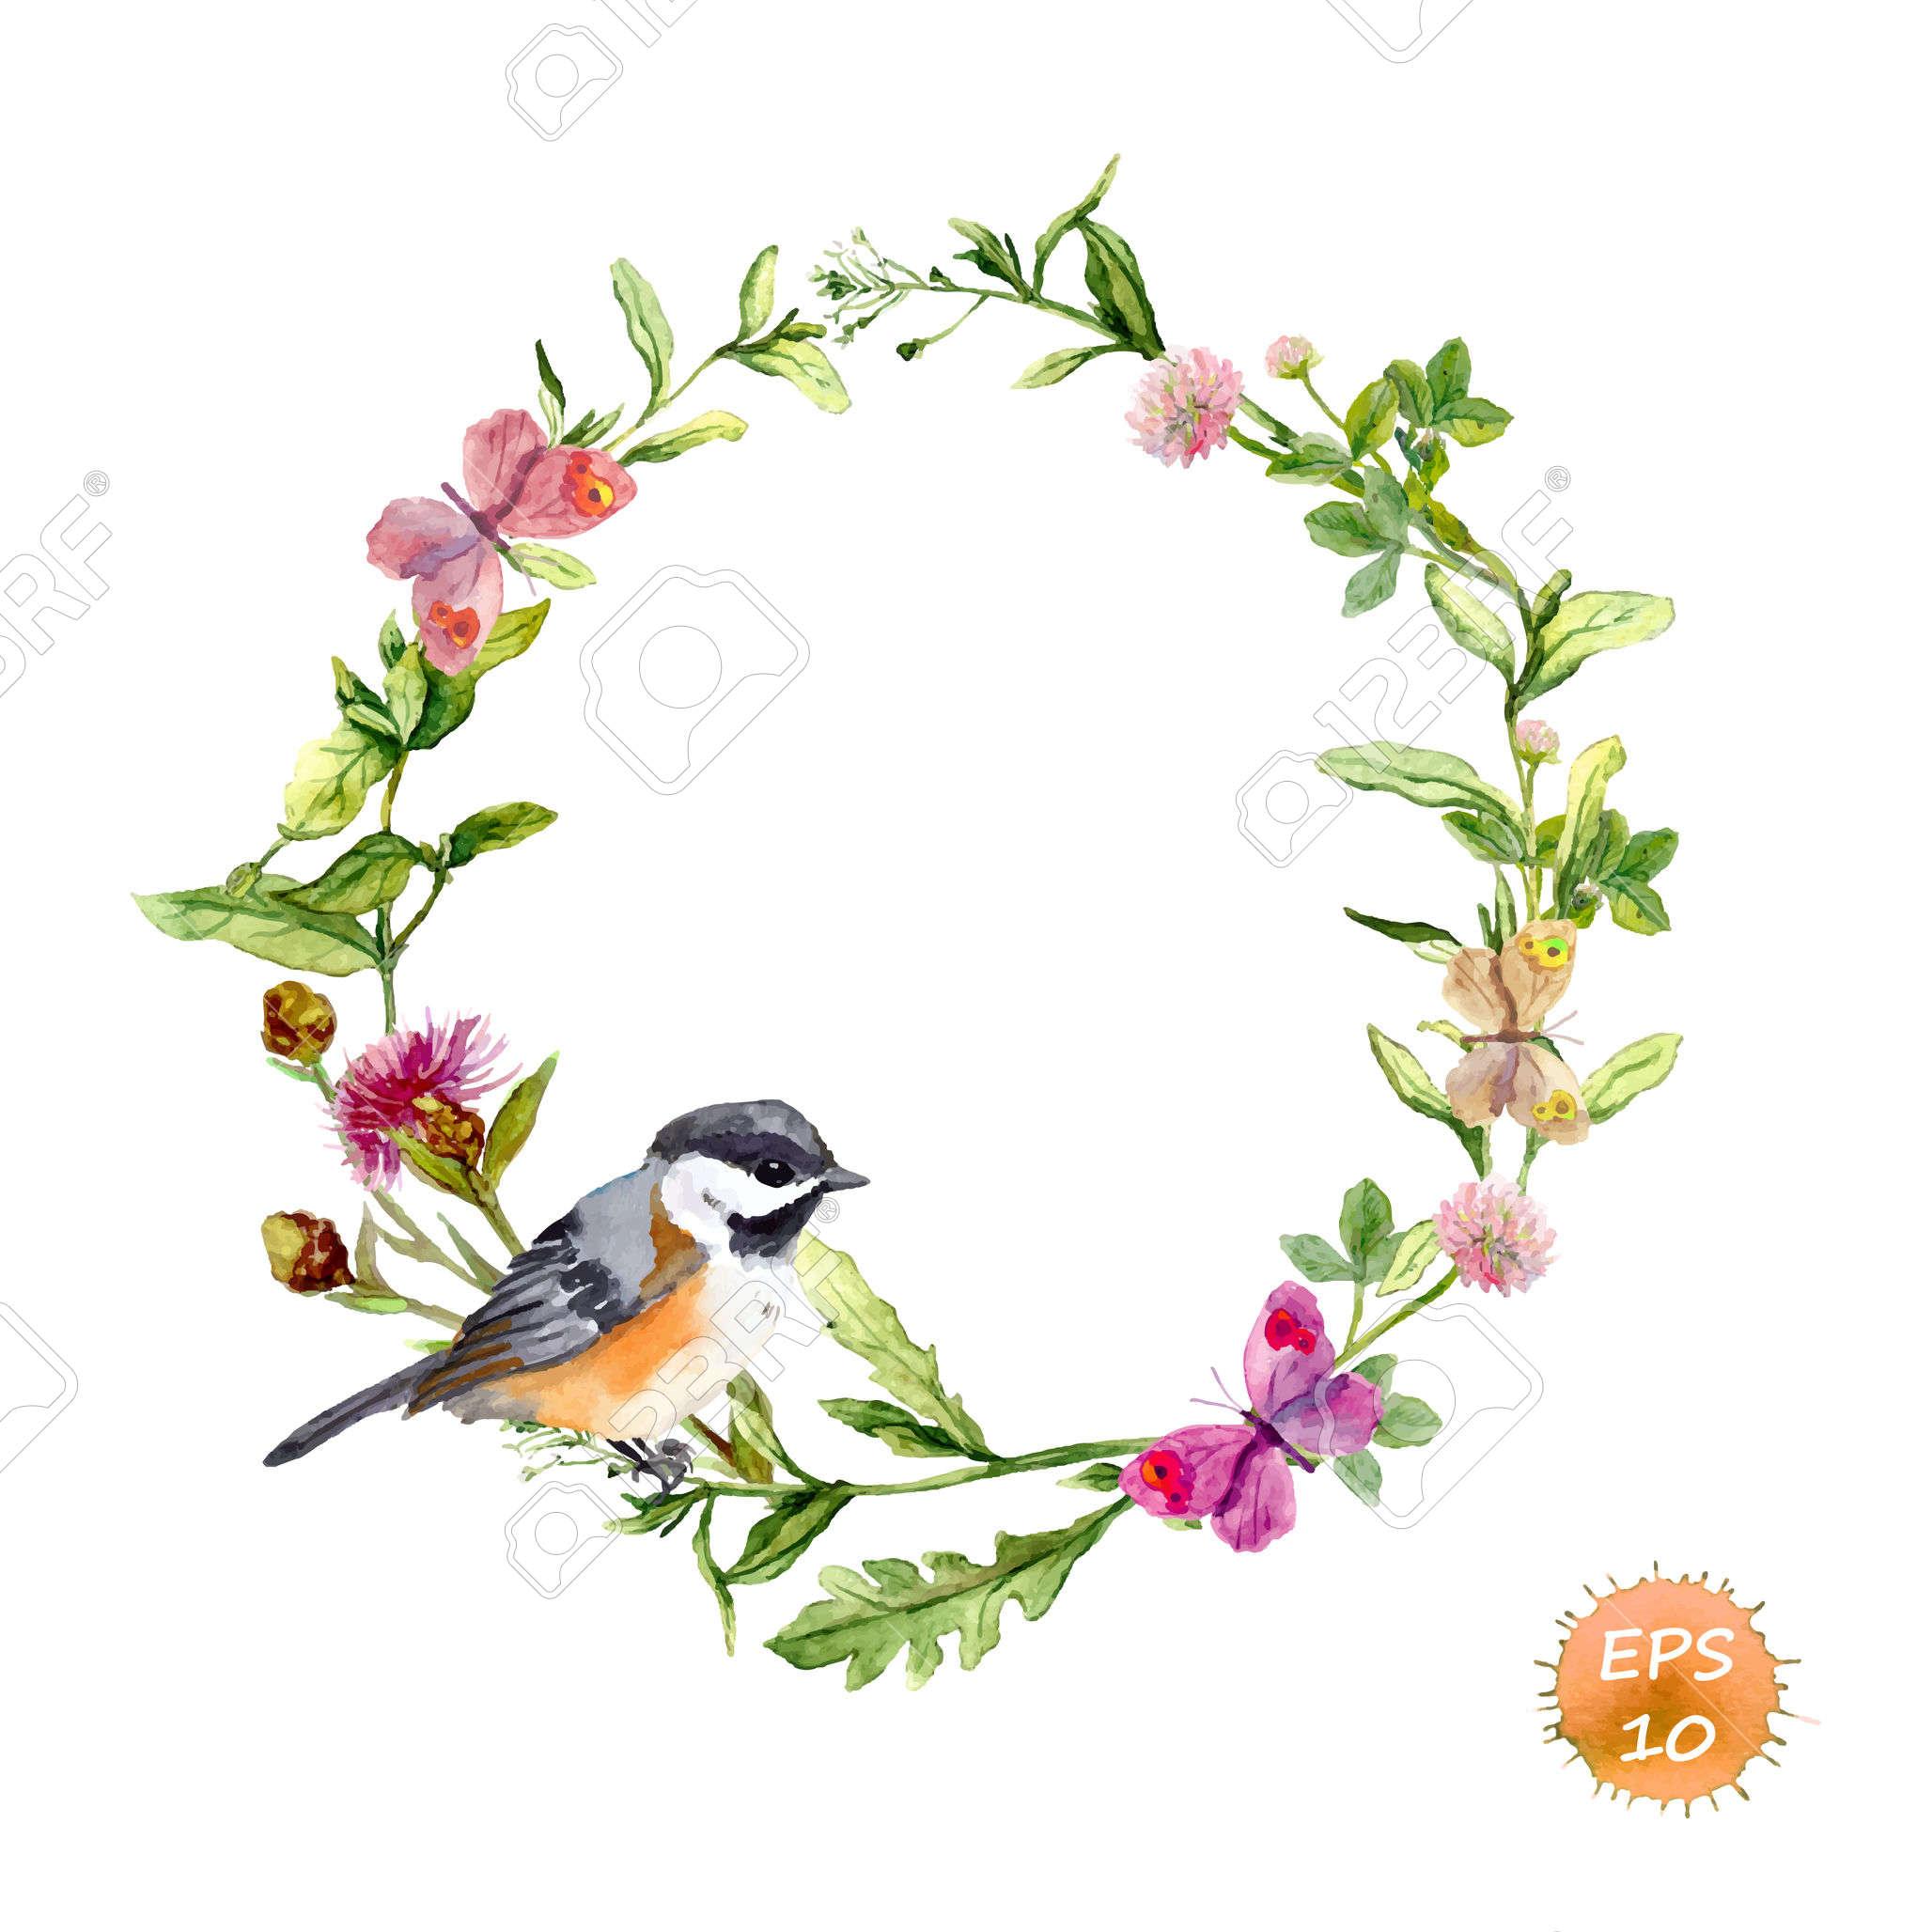 Wreath Border Frame With Wild Herbs, Meadow Flowers, Butterflies.